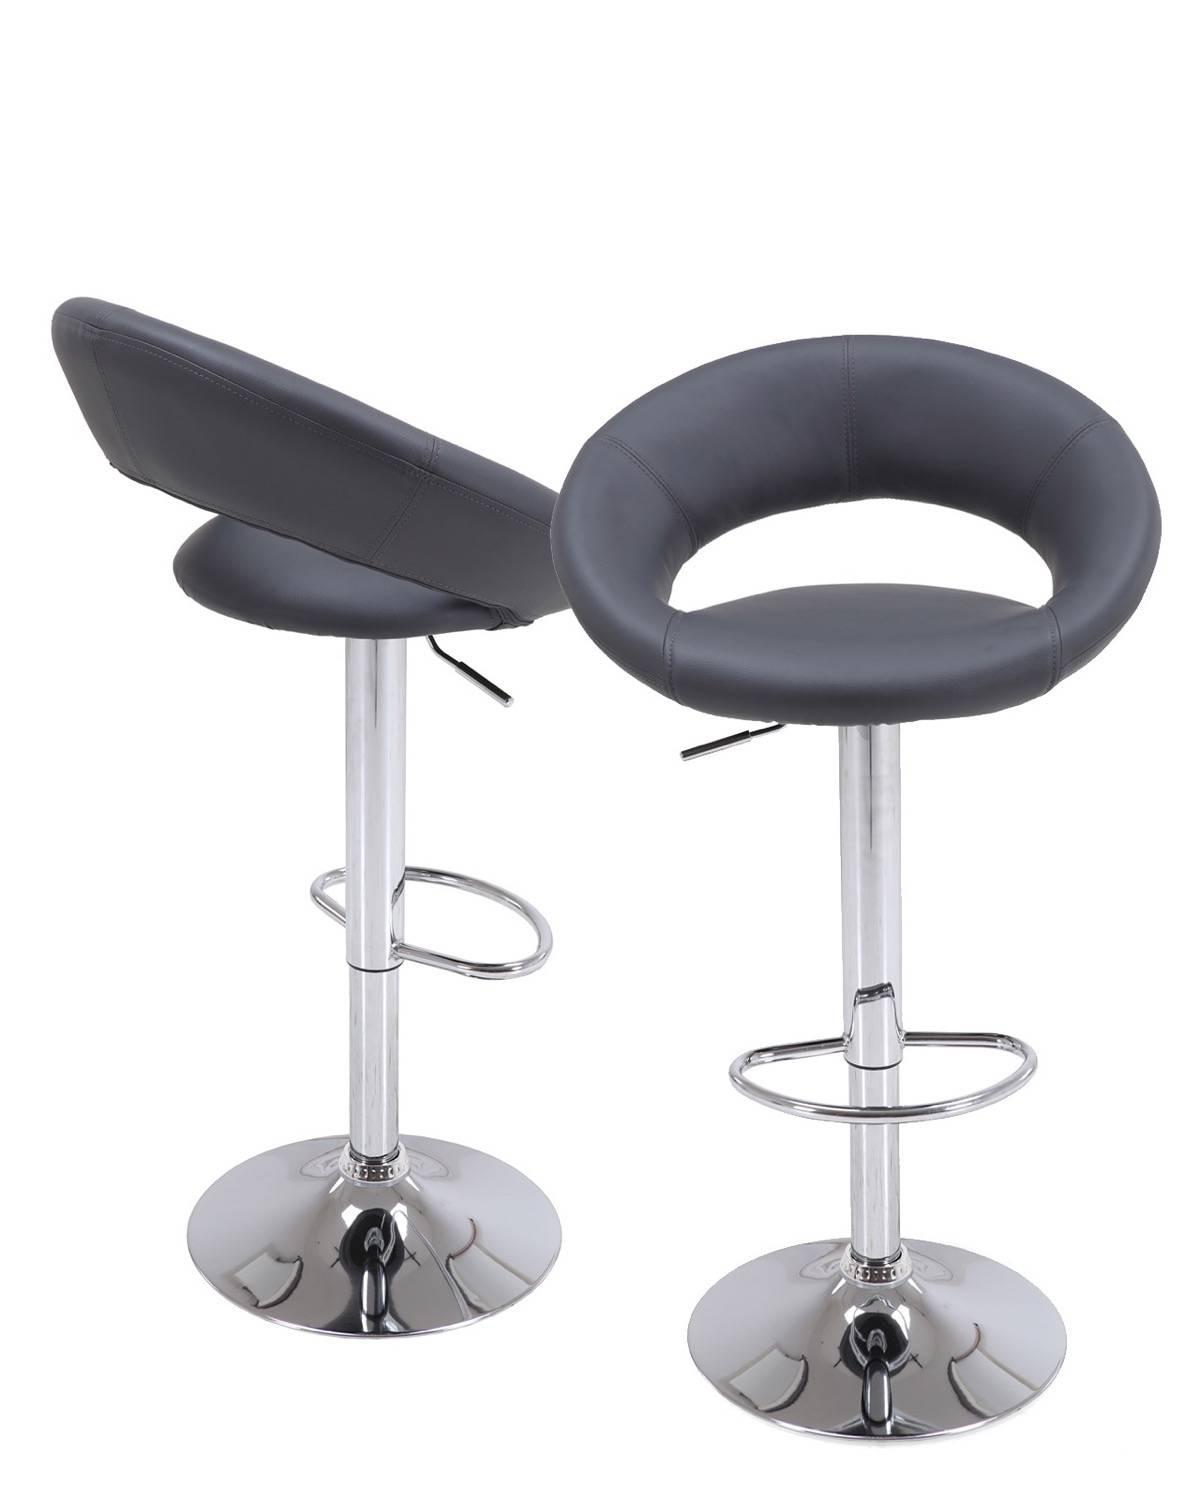 coda lot de 2 tabourets de bar design. Black Bedroom Furniture Sets. Home Design Ideas